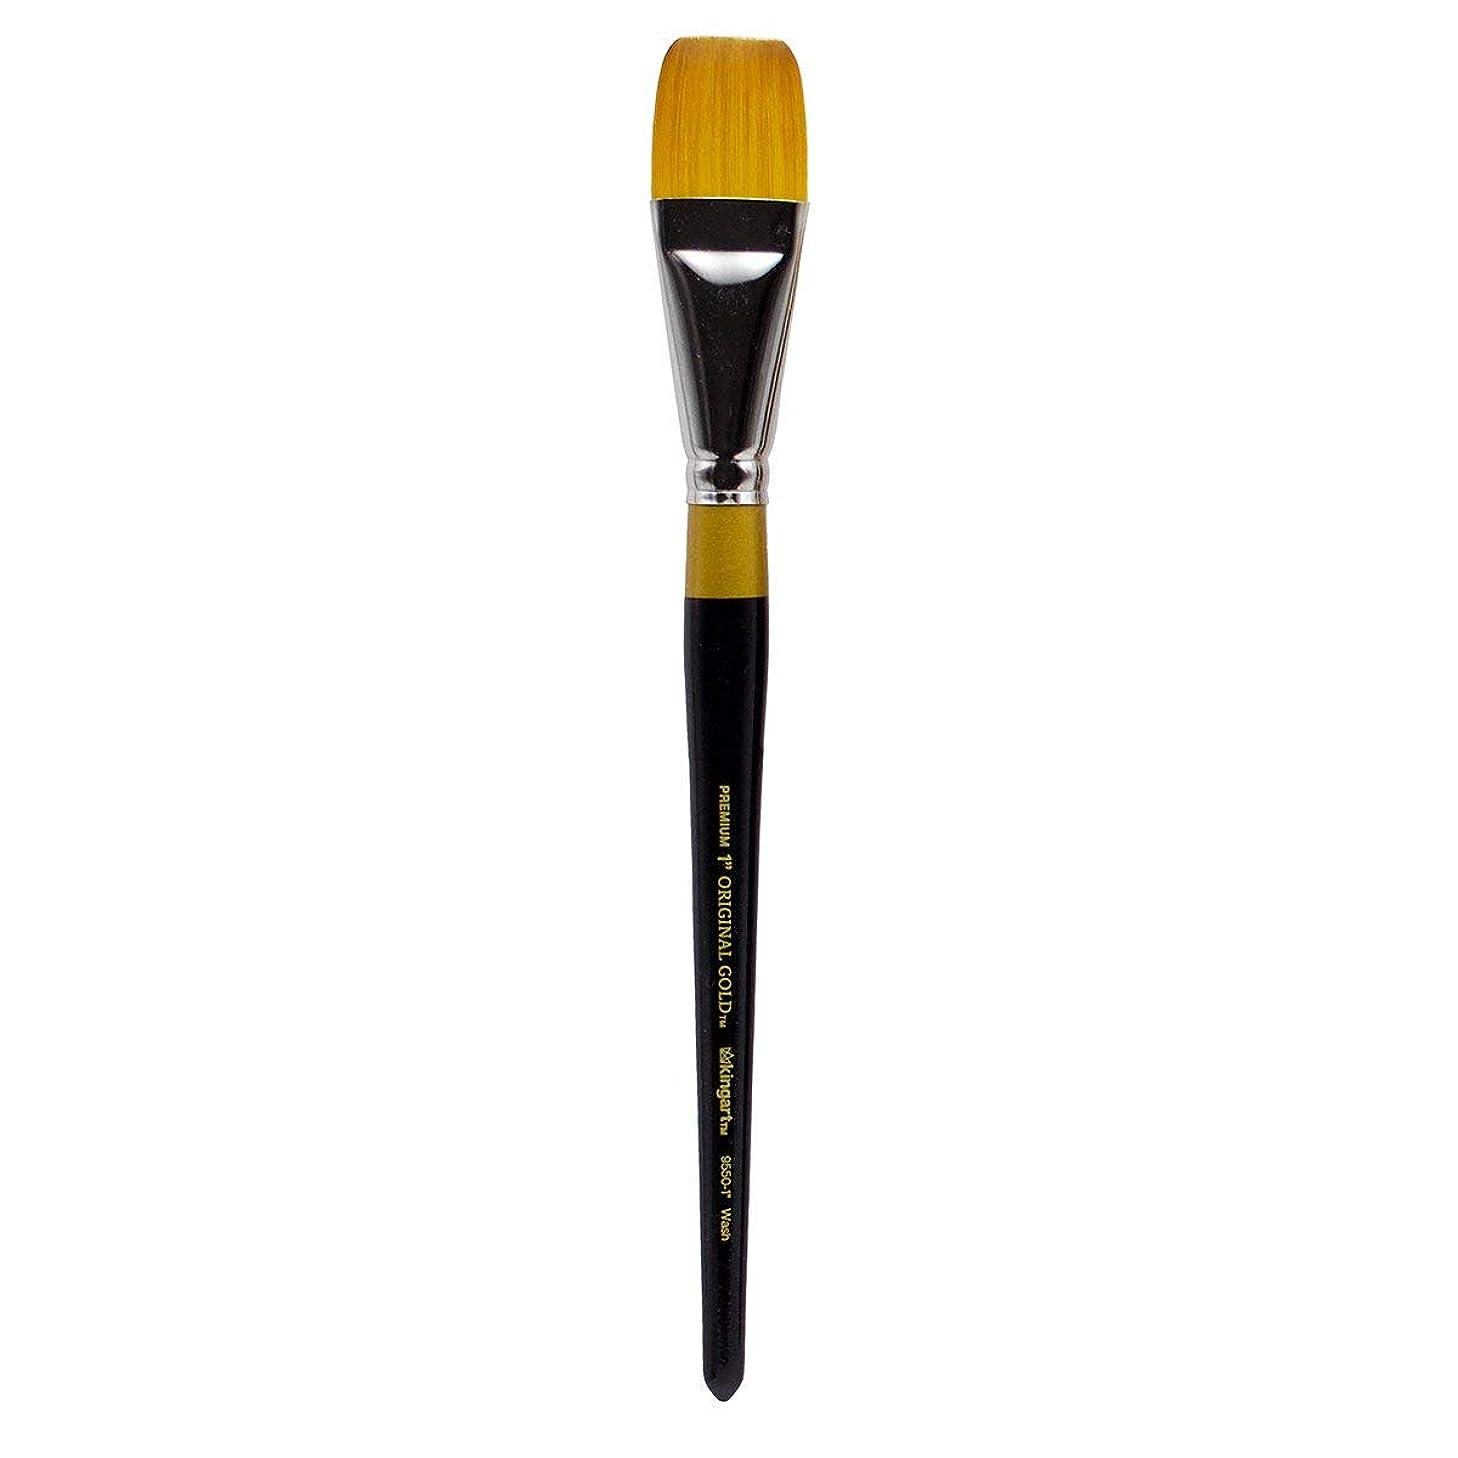 KINGART Original Gold Flat Glaze 9550-3/4, Premium Artist Brush, Golden TAKLON WASH-Size: 3/4, Black